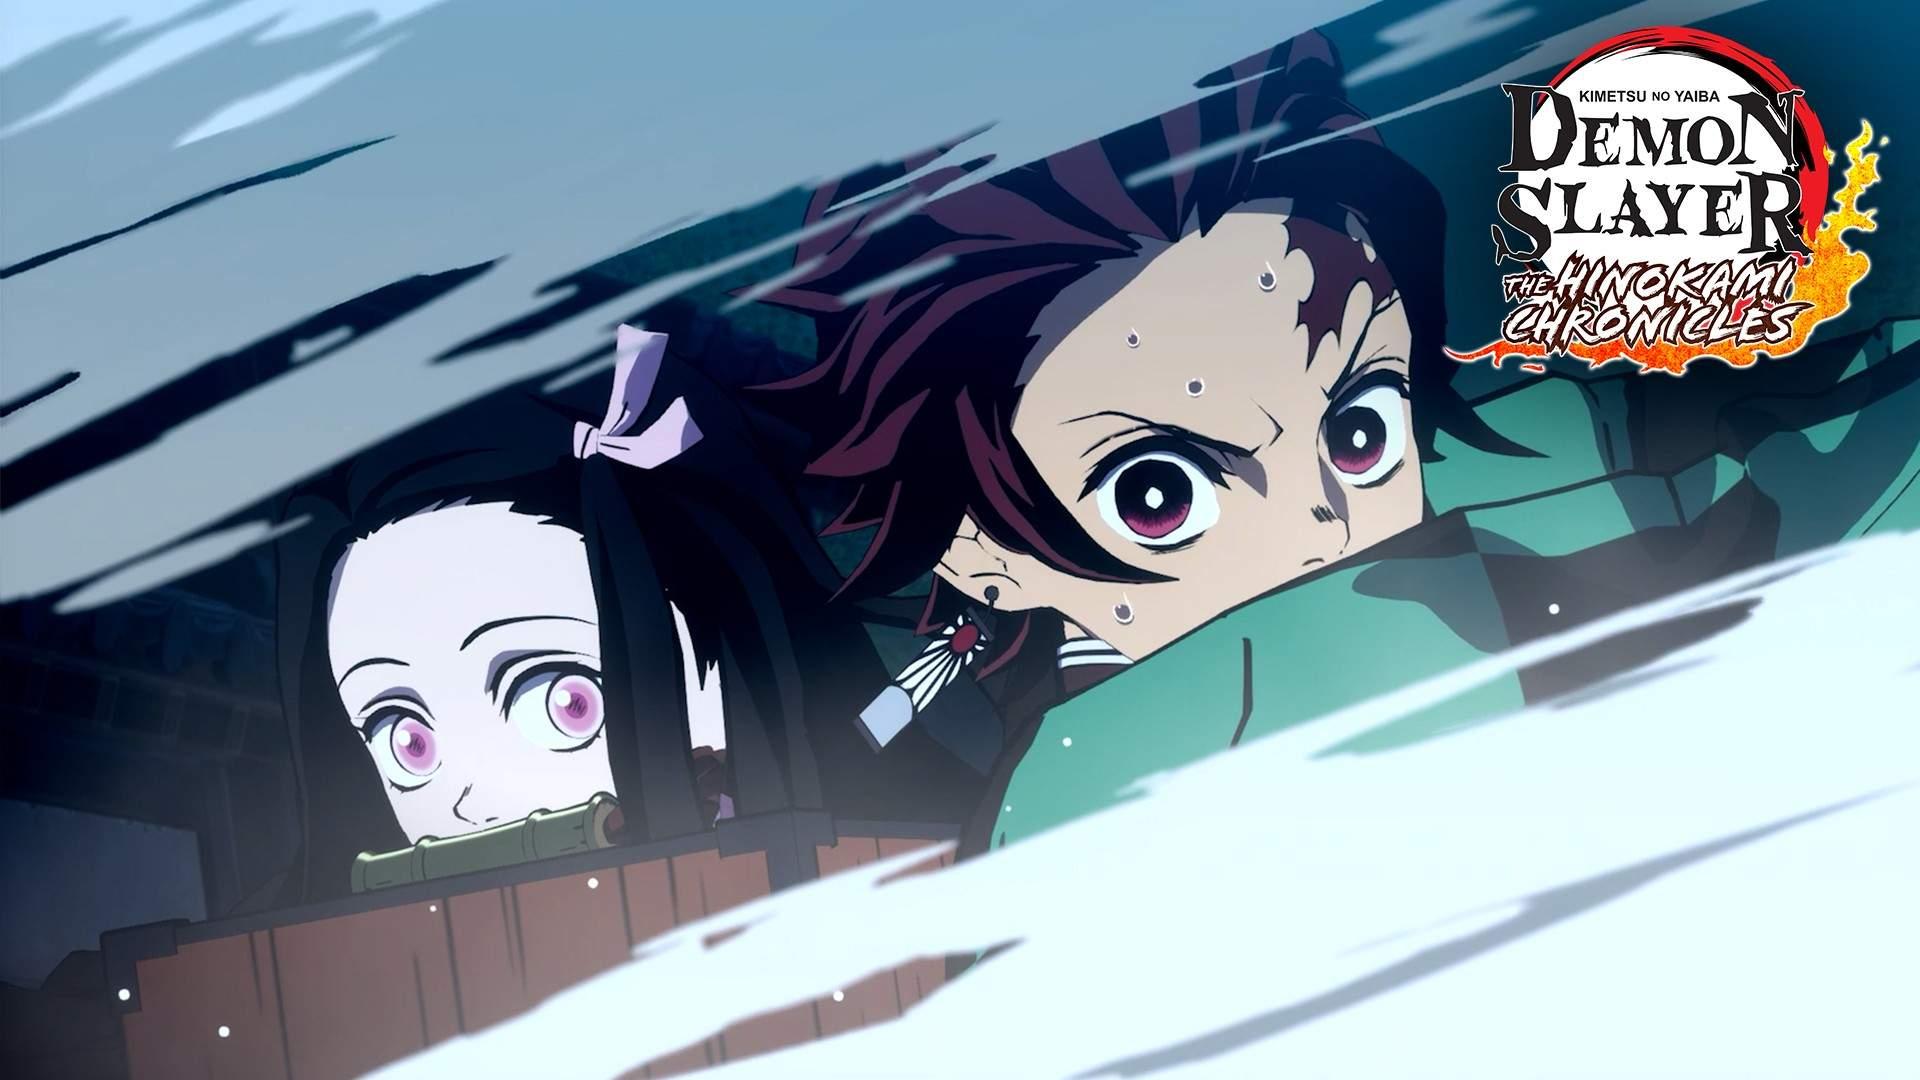 Video For Demon Slayer -Kimetsu no Yaiba- The Hinokami Chronicles Cuts Through Xbox Starting Today